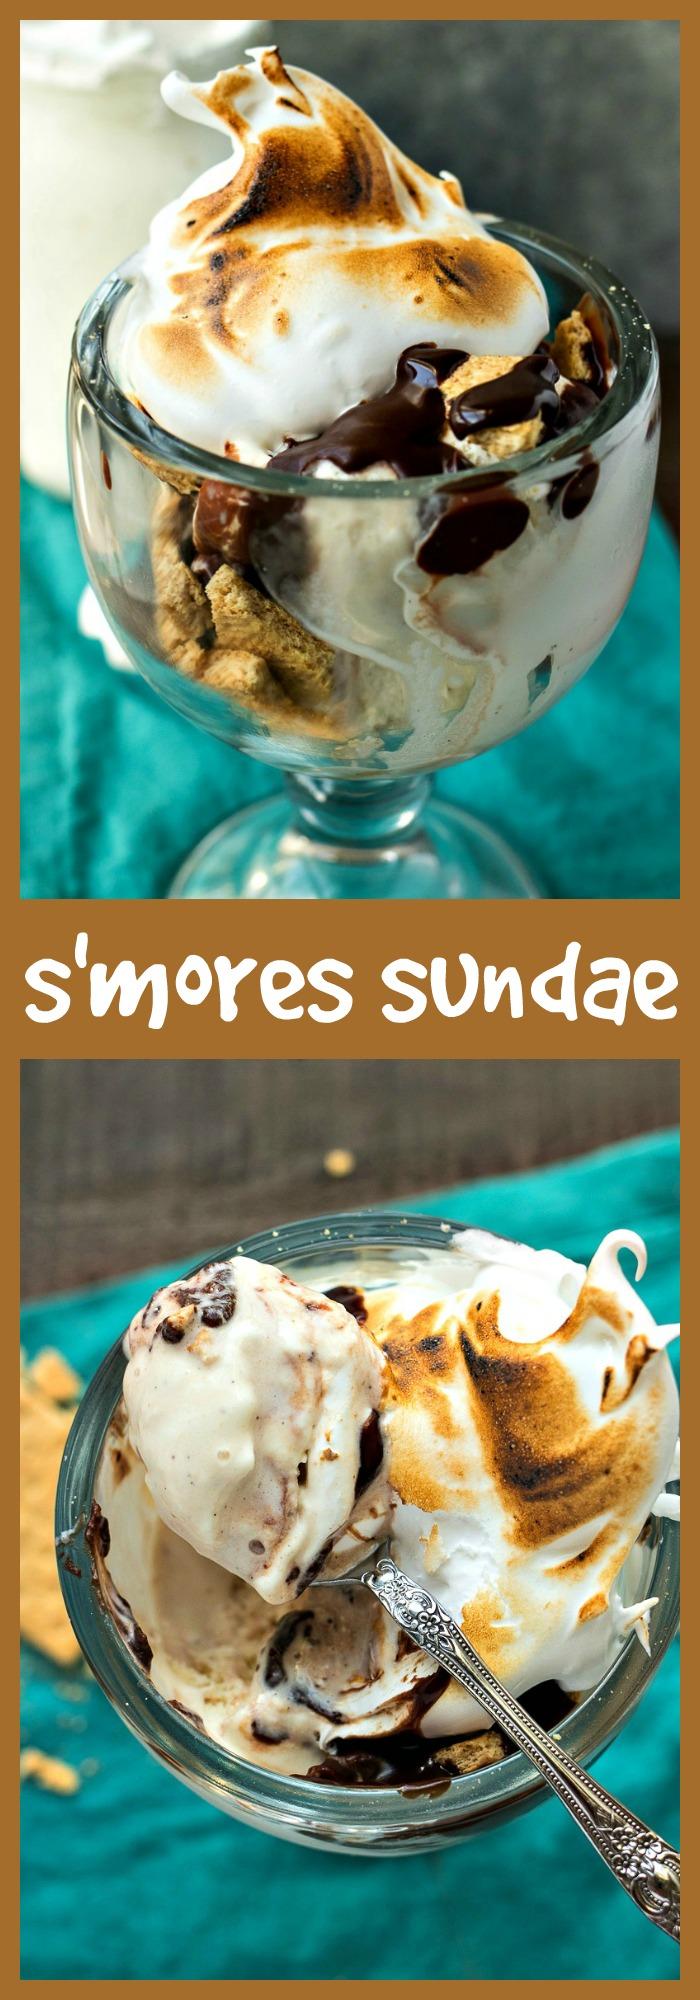 S'mores Sundae photo collage